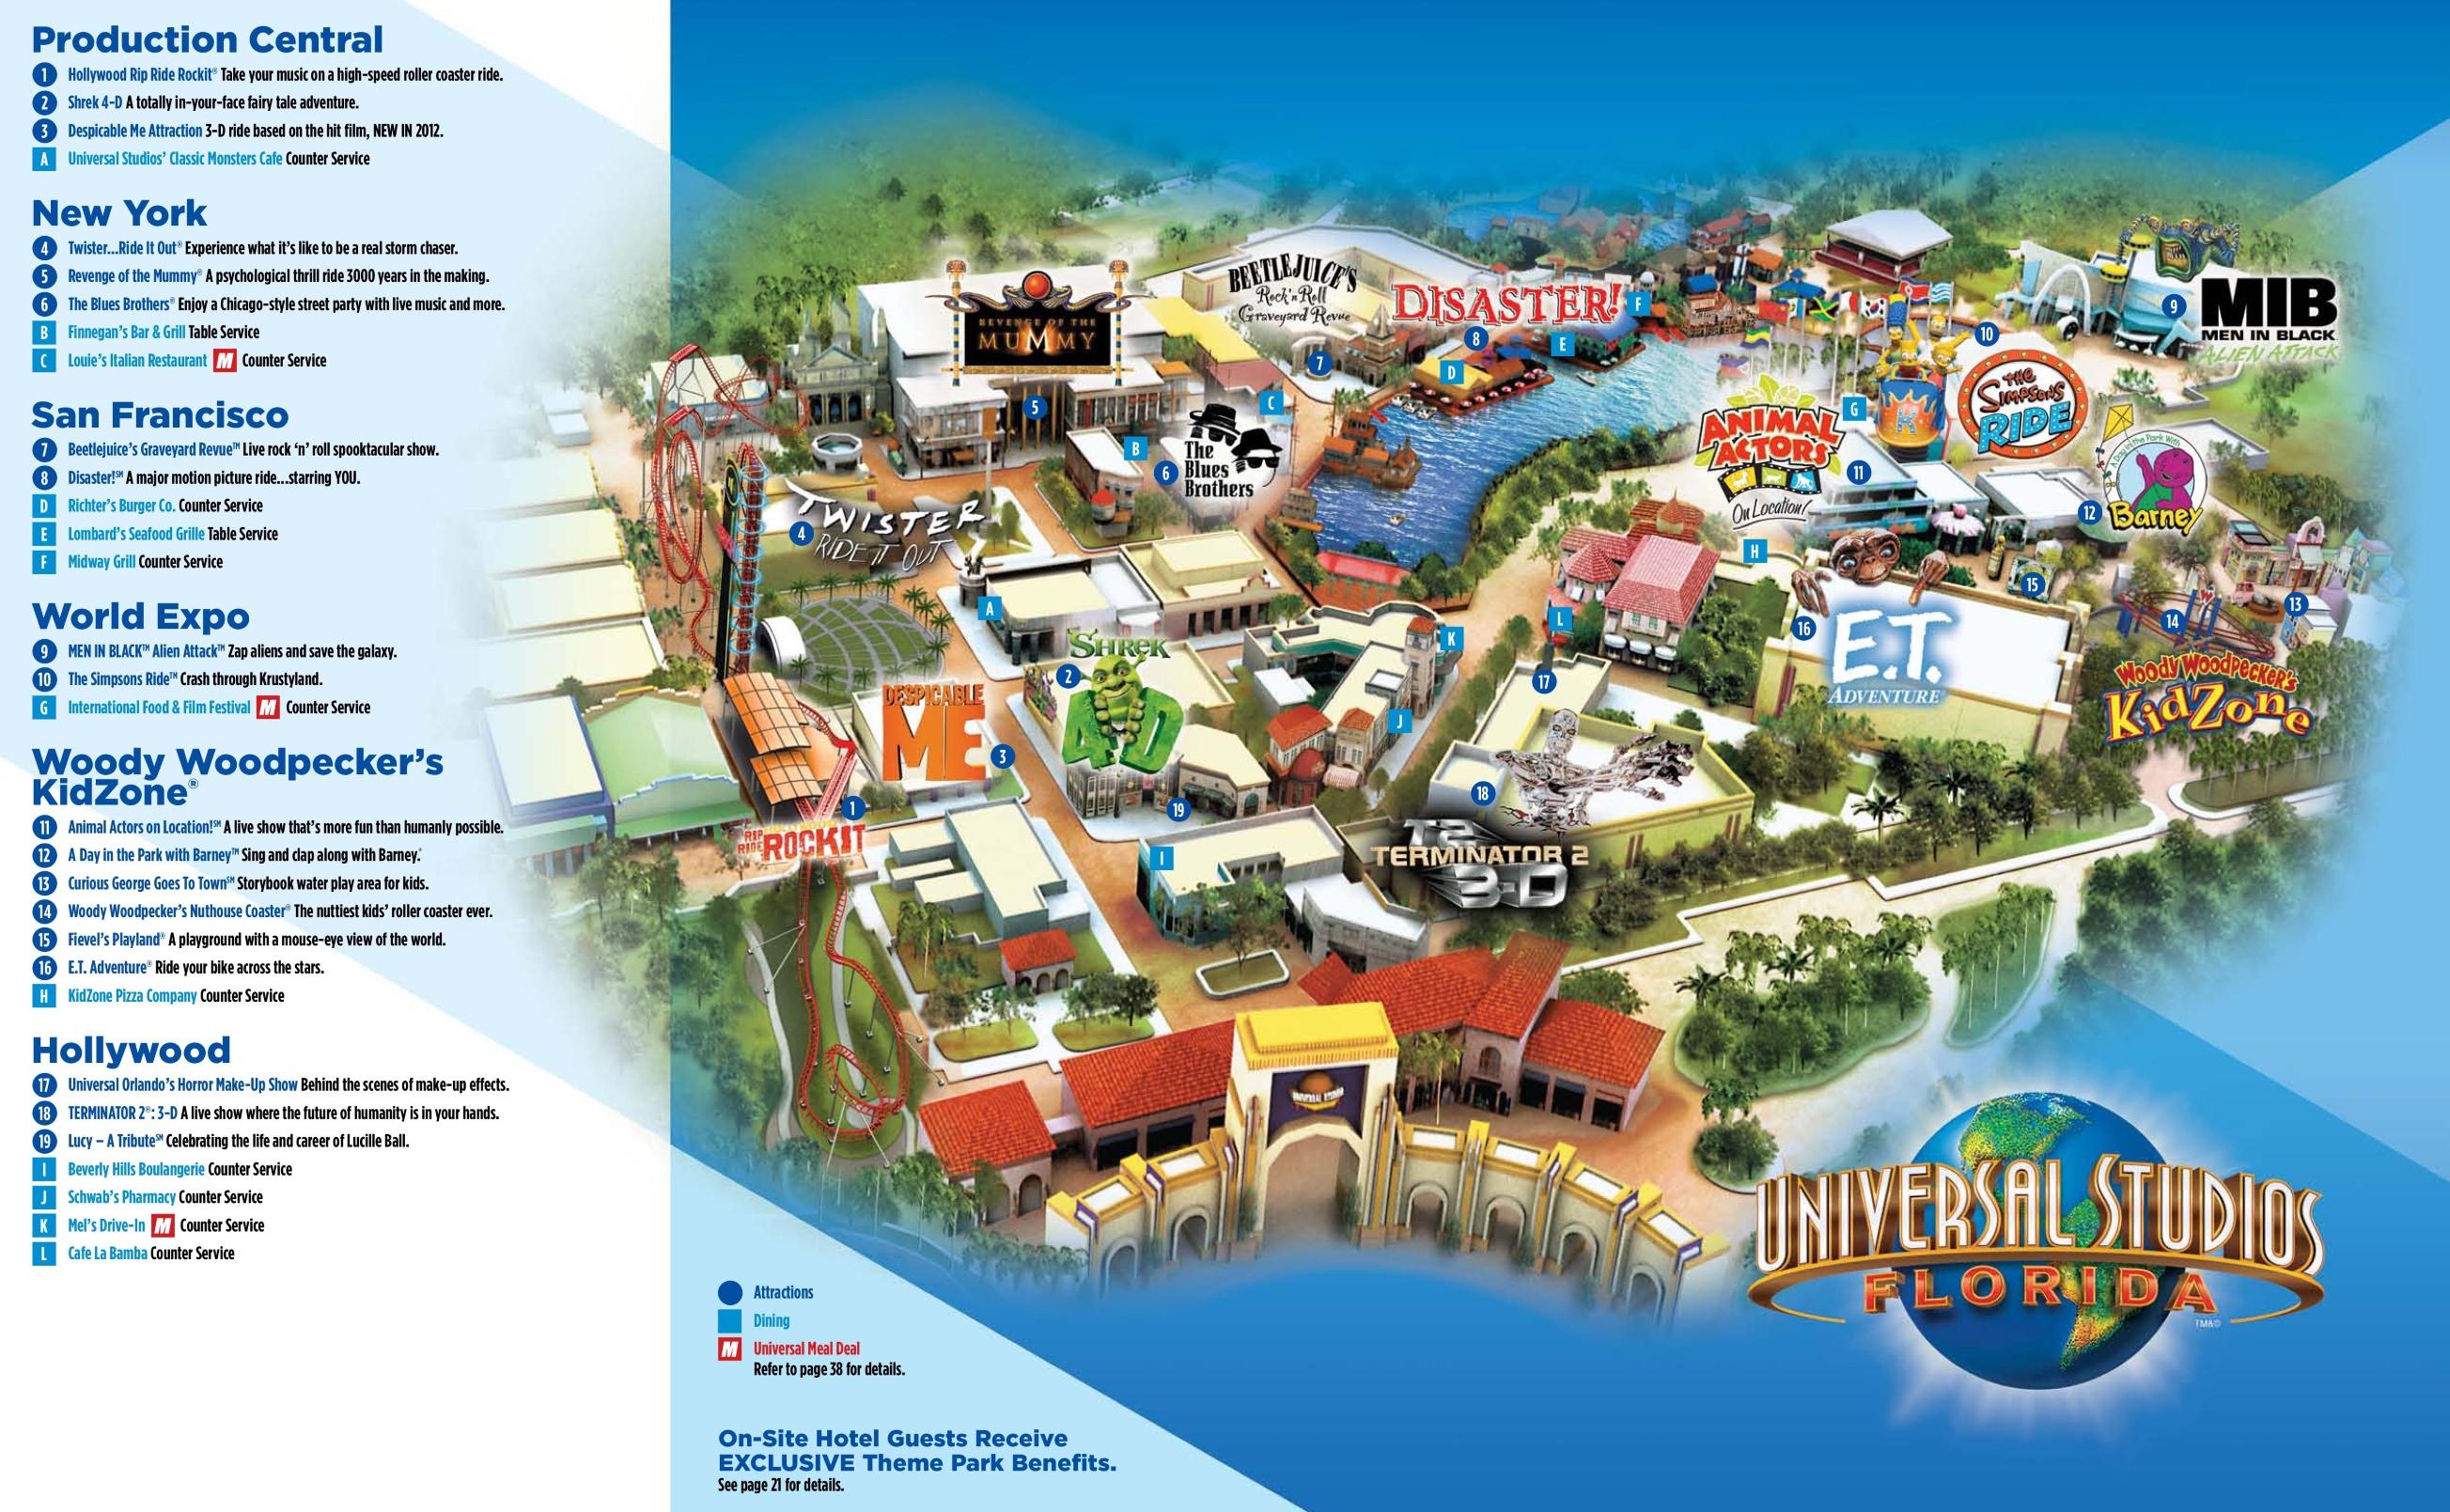 Orlando Universal Studios Florida Map Map Hd Universal Studios Map - Universal Parks Florida Map